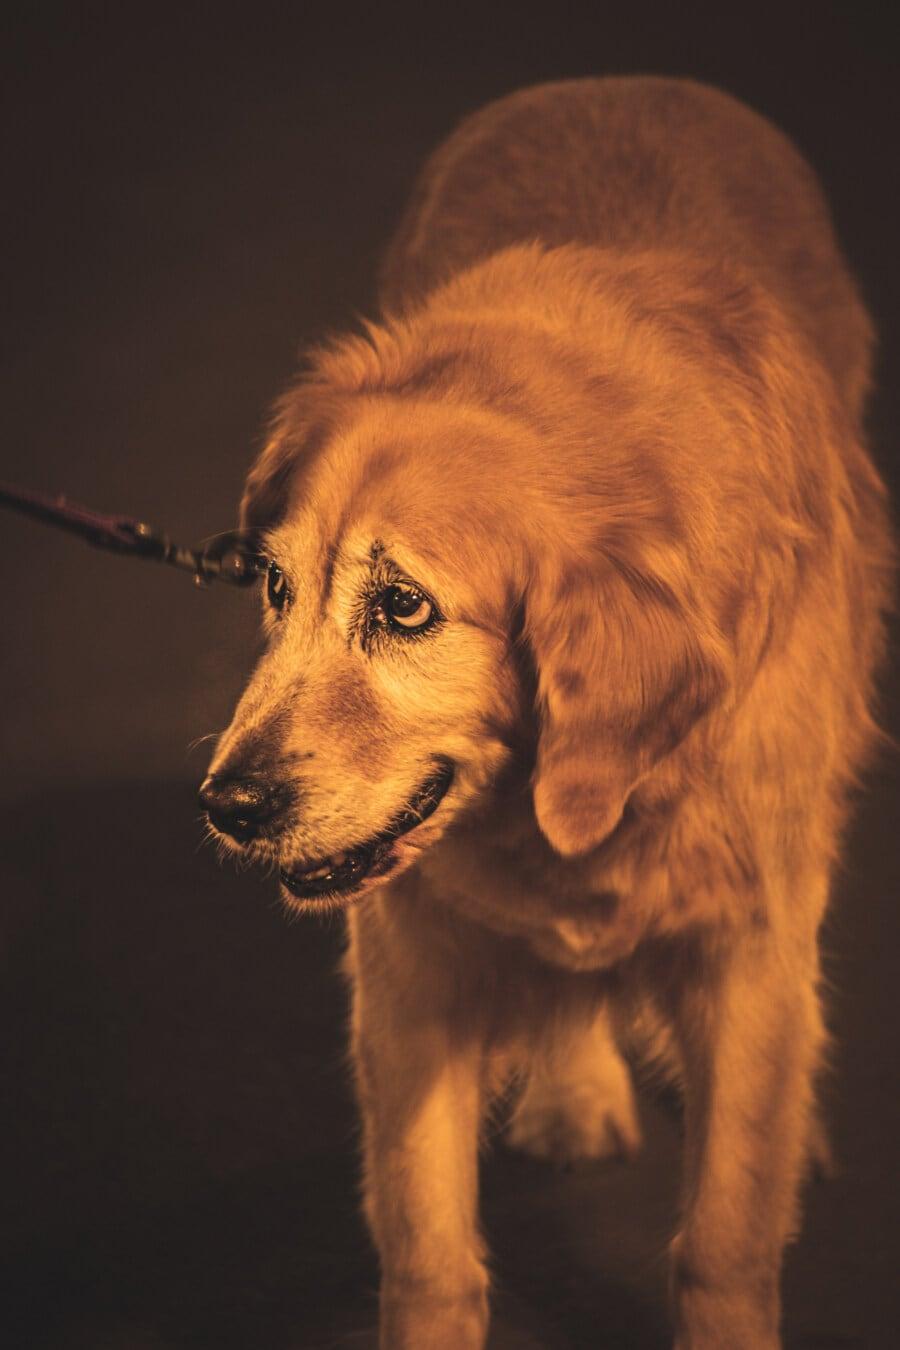 dog, old, walking, evening, cute, puppy, pet, retriever, breed, hunting dog